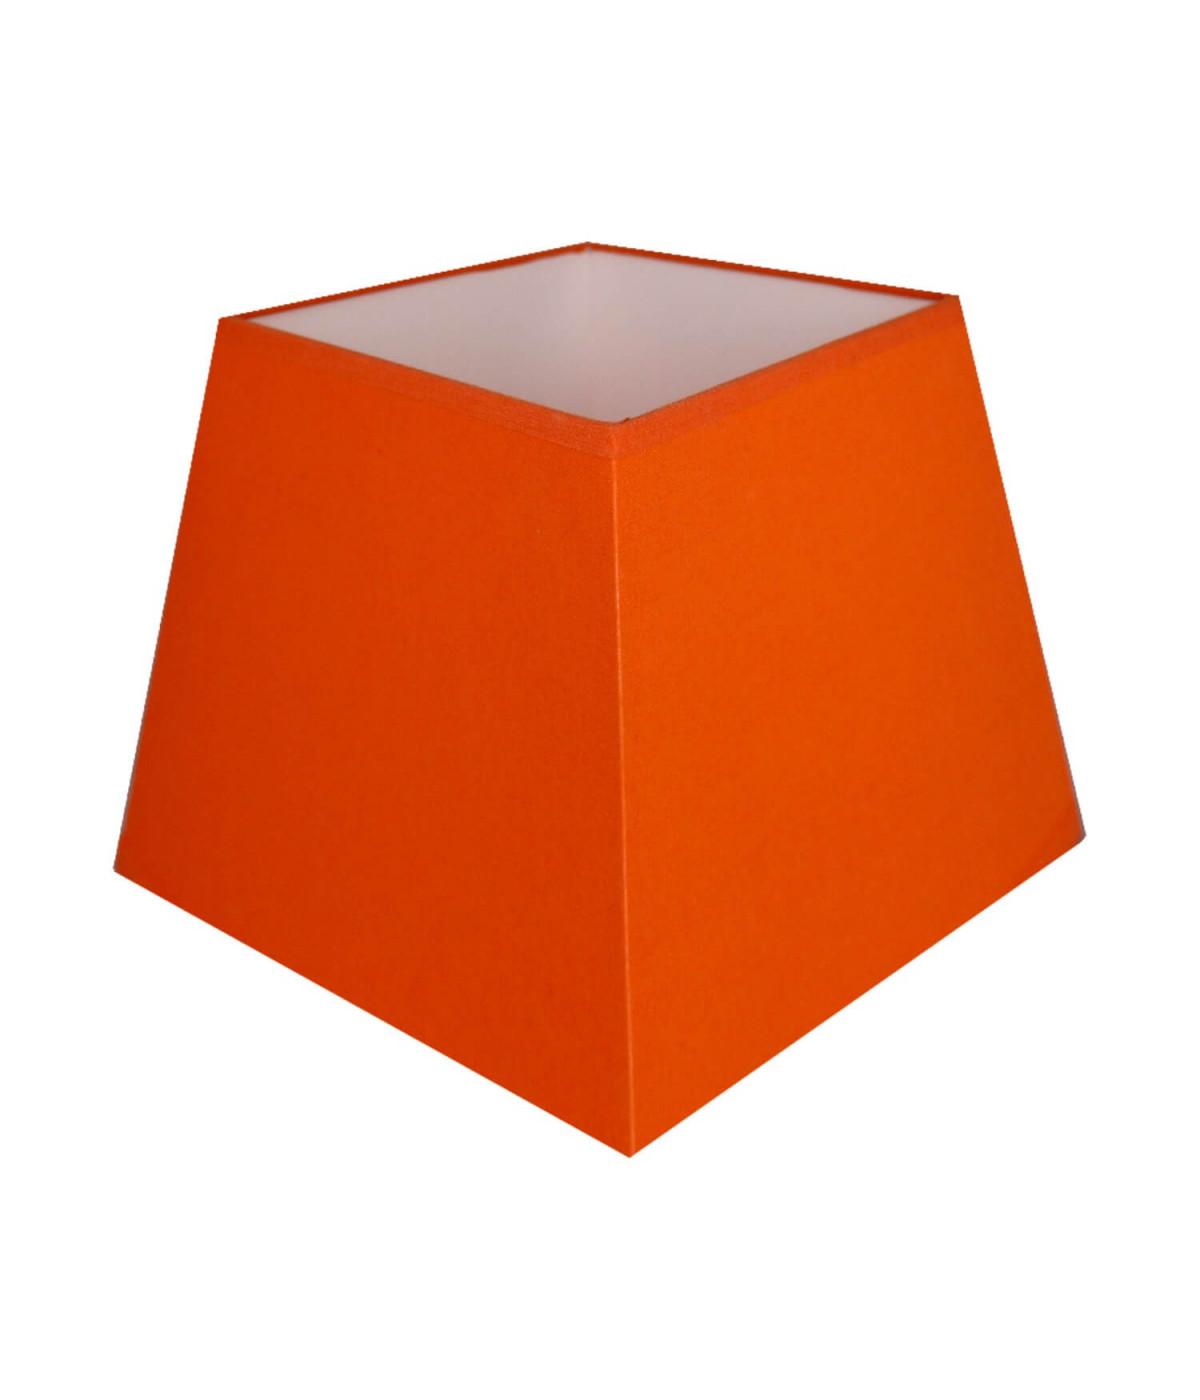 Abat-jour carre pyramidal Orange